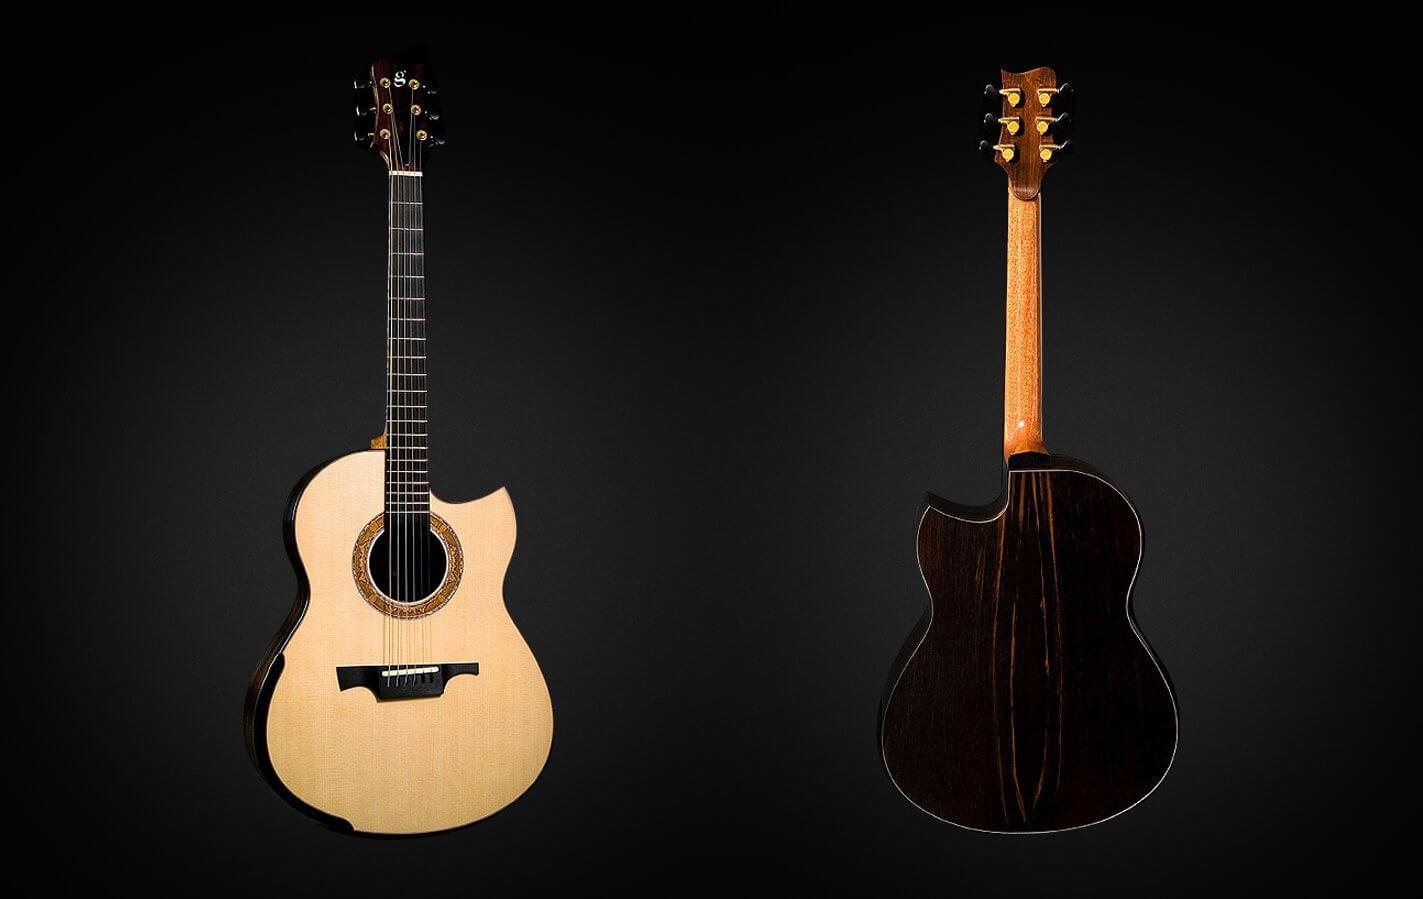 Greenfield Guitars | Fine handmade Acoustic Guitars Model G2, Lutz spruce, Brazilian rosewood, Laskin arm rest